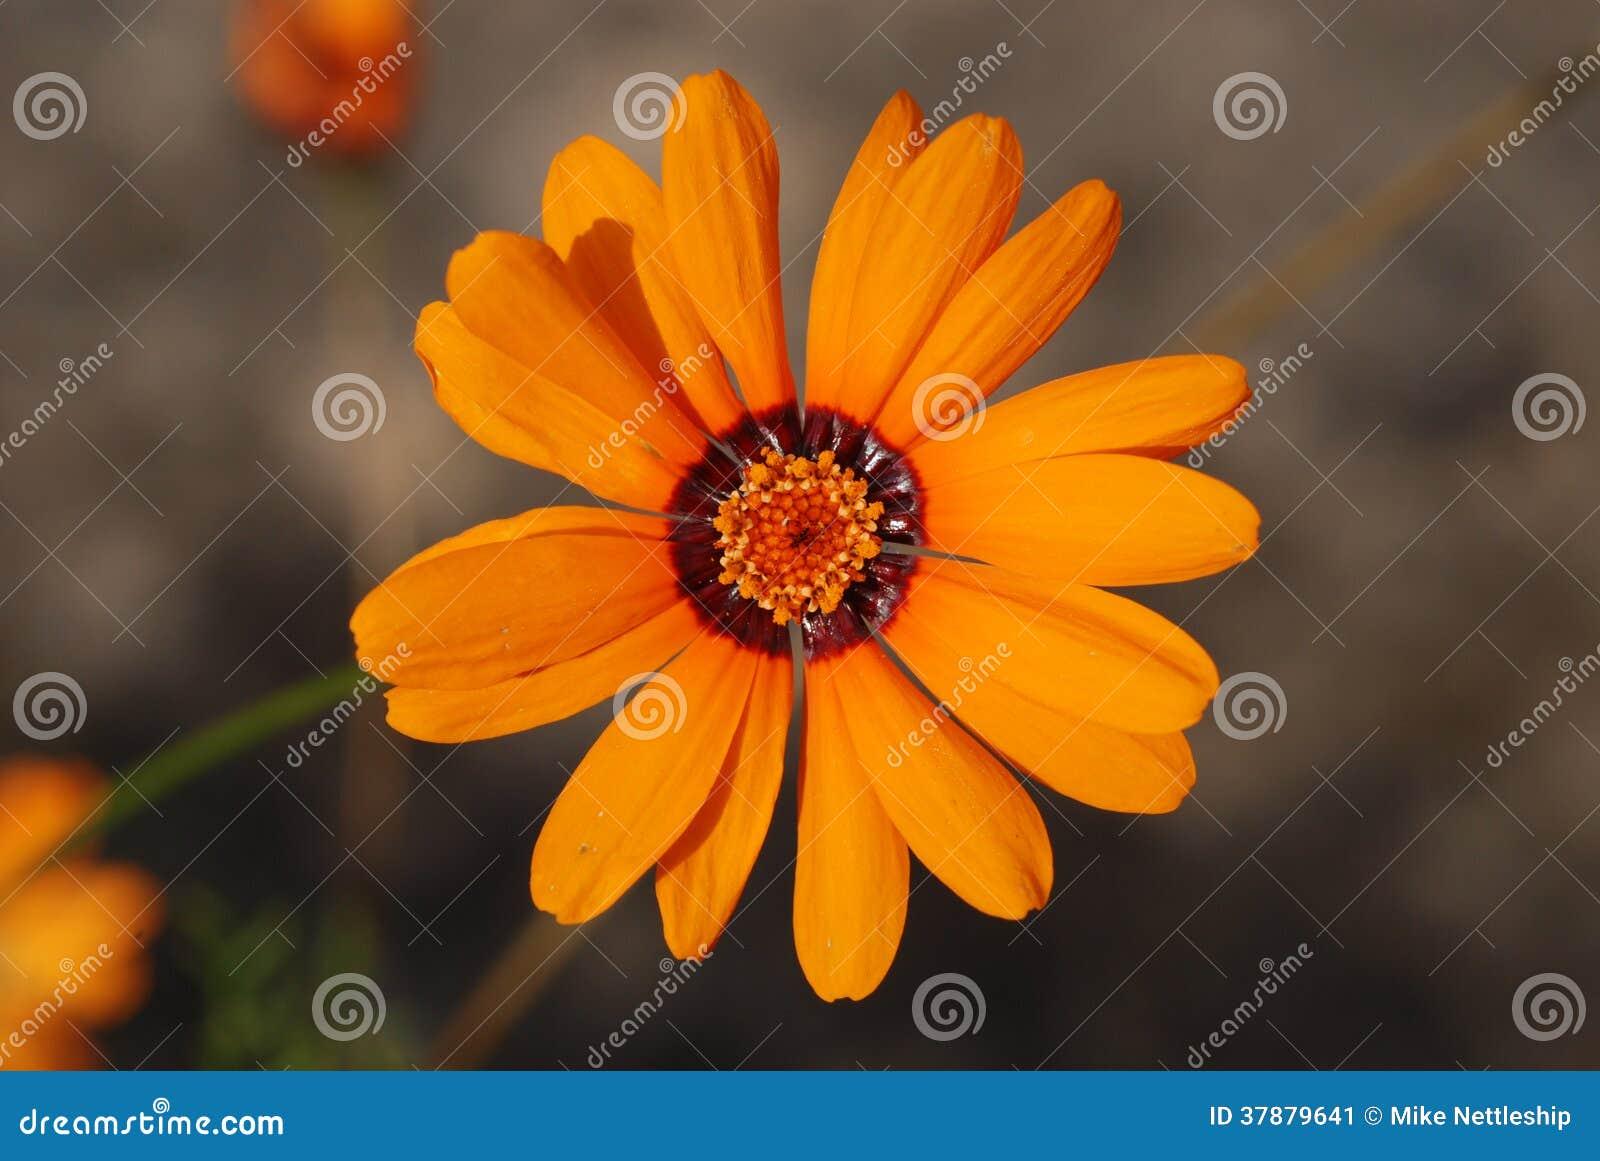 Oranje bloem met donkere ring